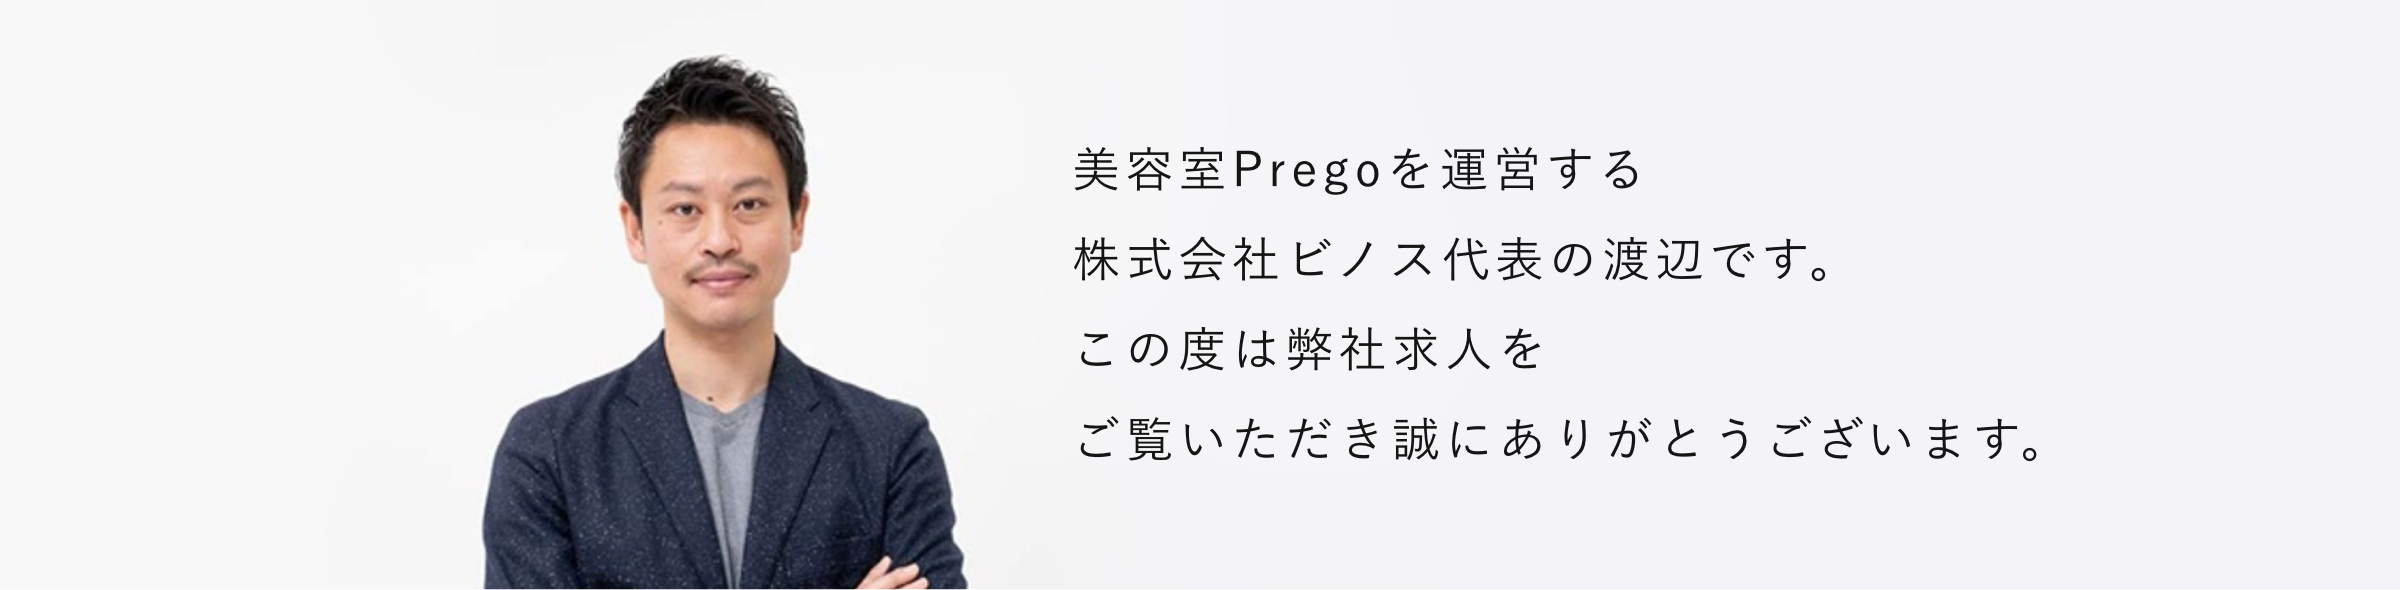 株式会社ビノス代表取締役渡辺 敦